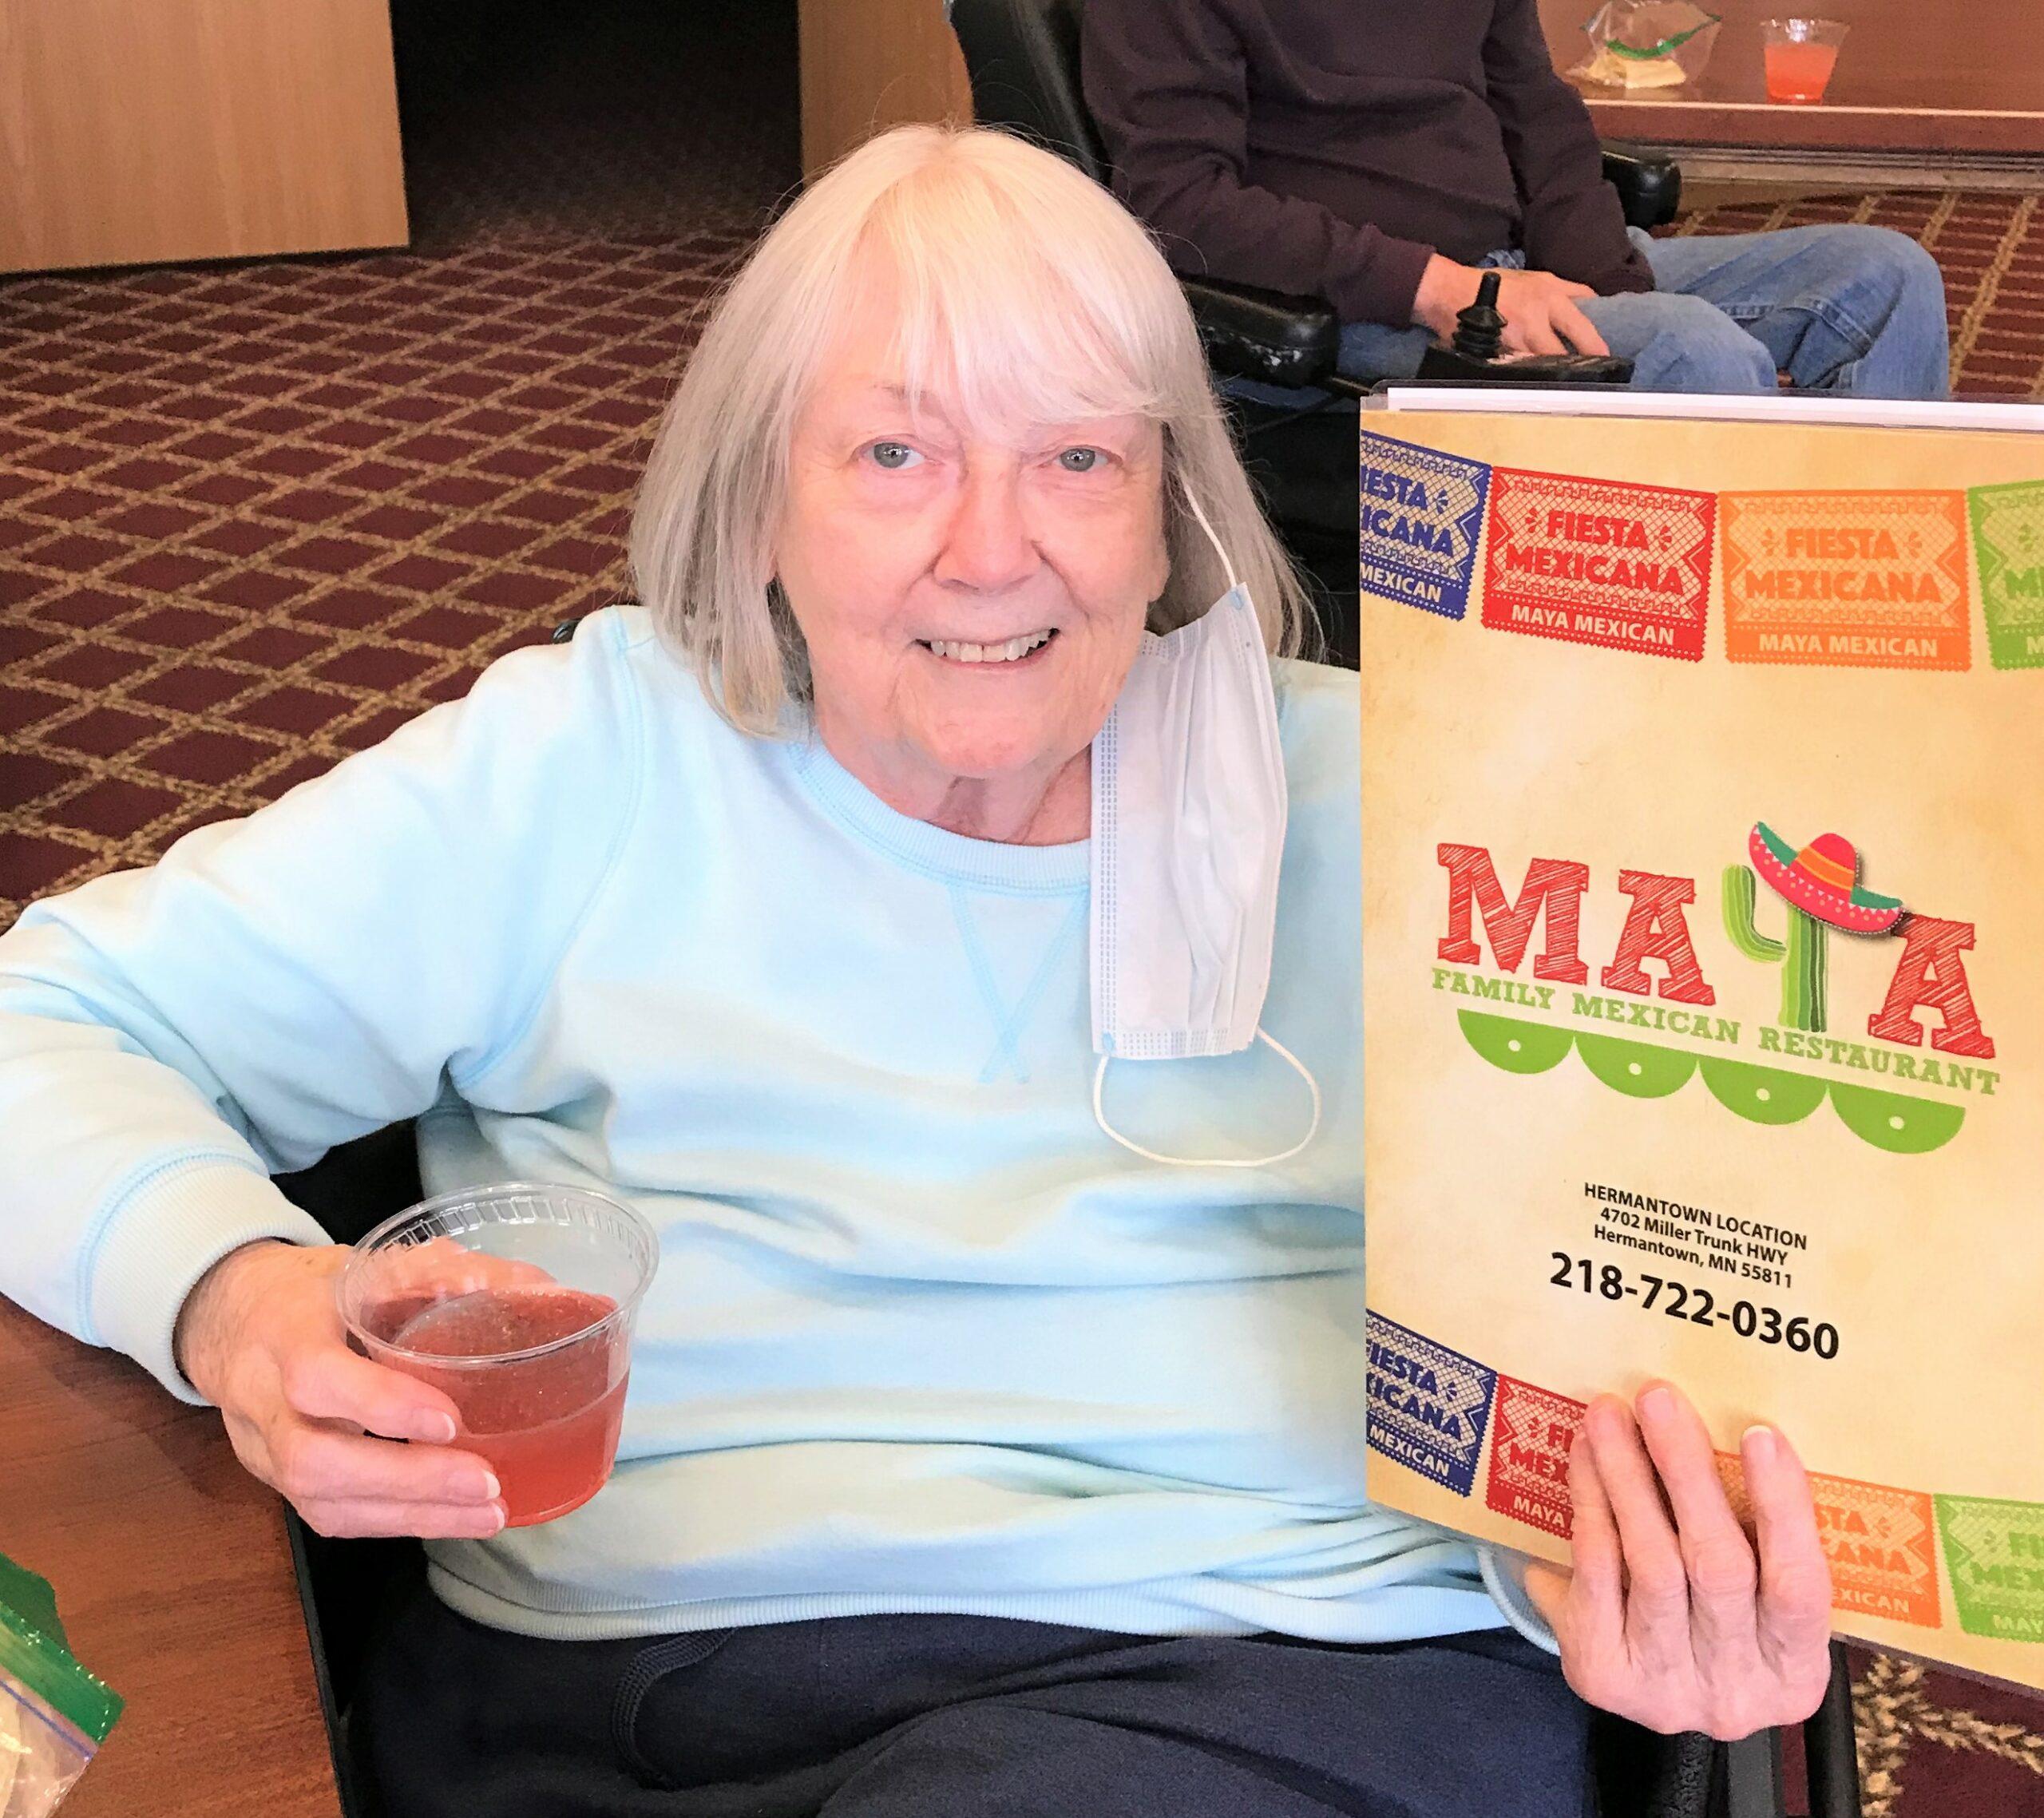 Thank you Maya for helping us celebrate National Margarita Day!!!